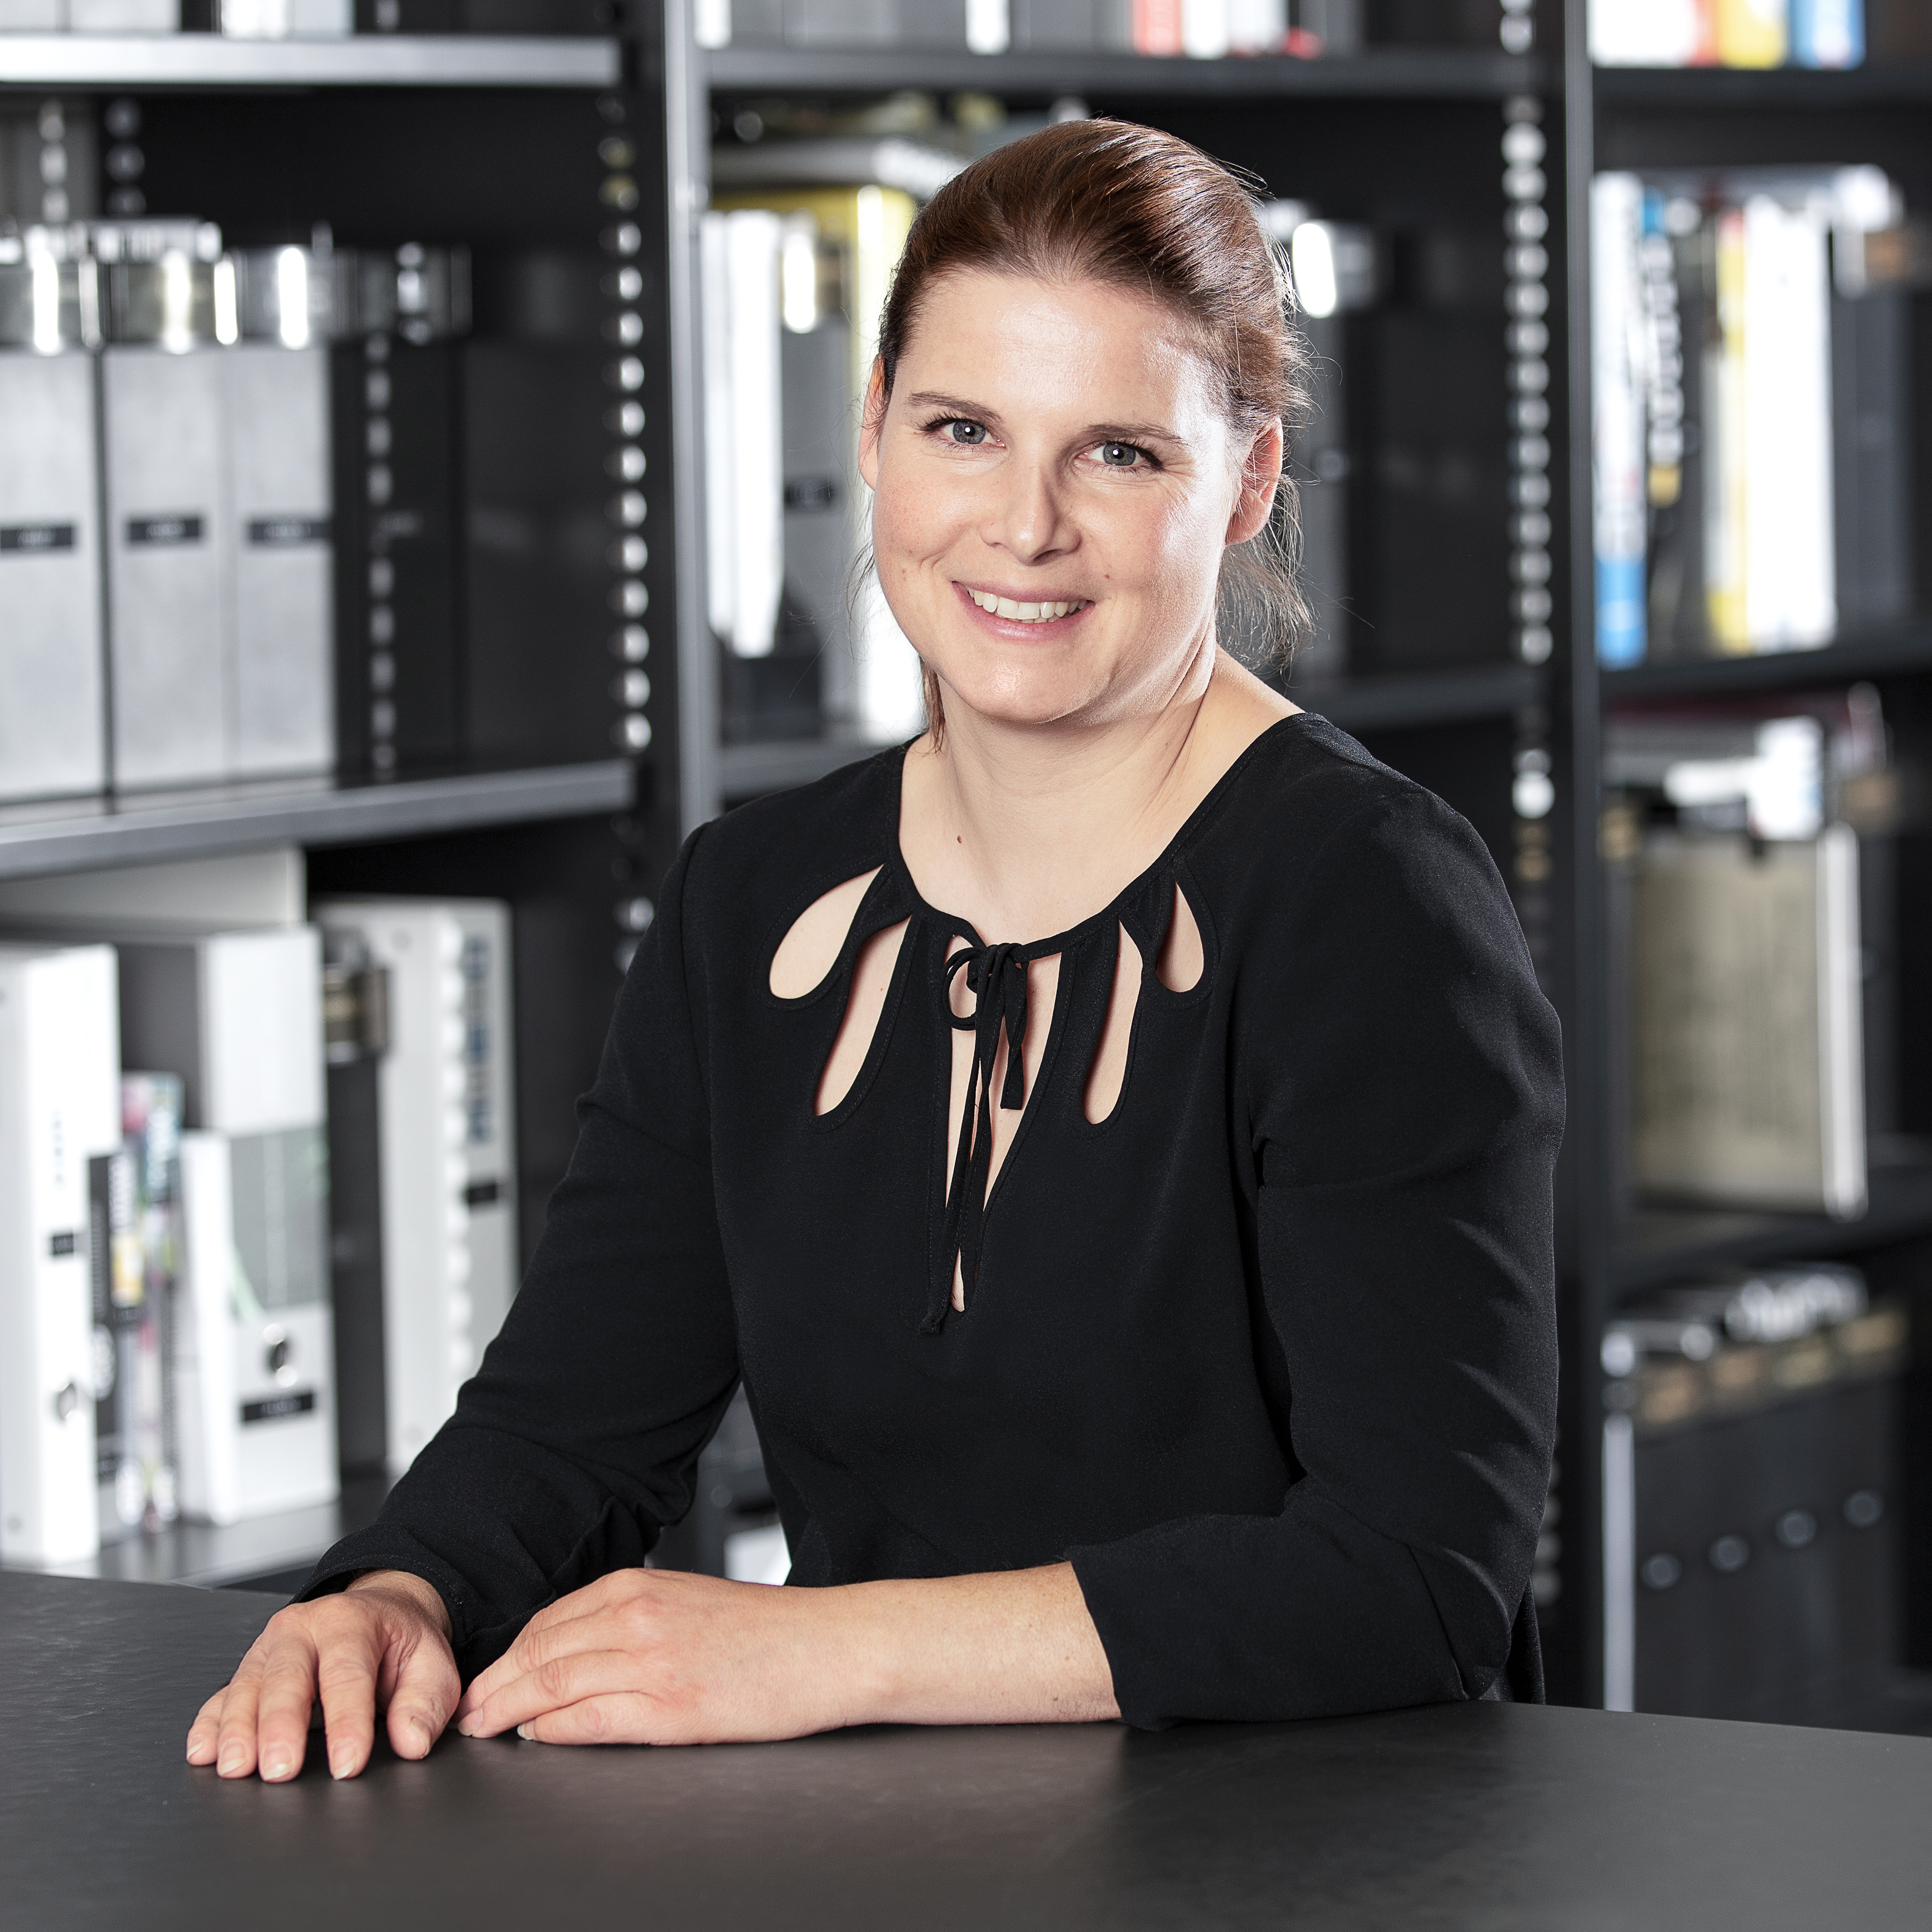 Janine Röthlisberger